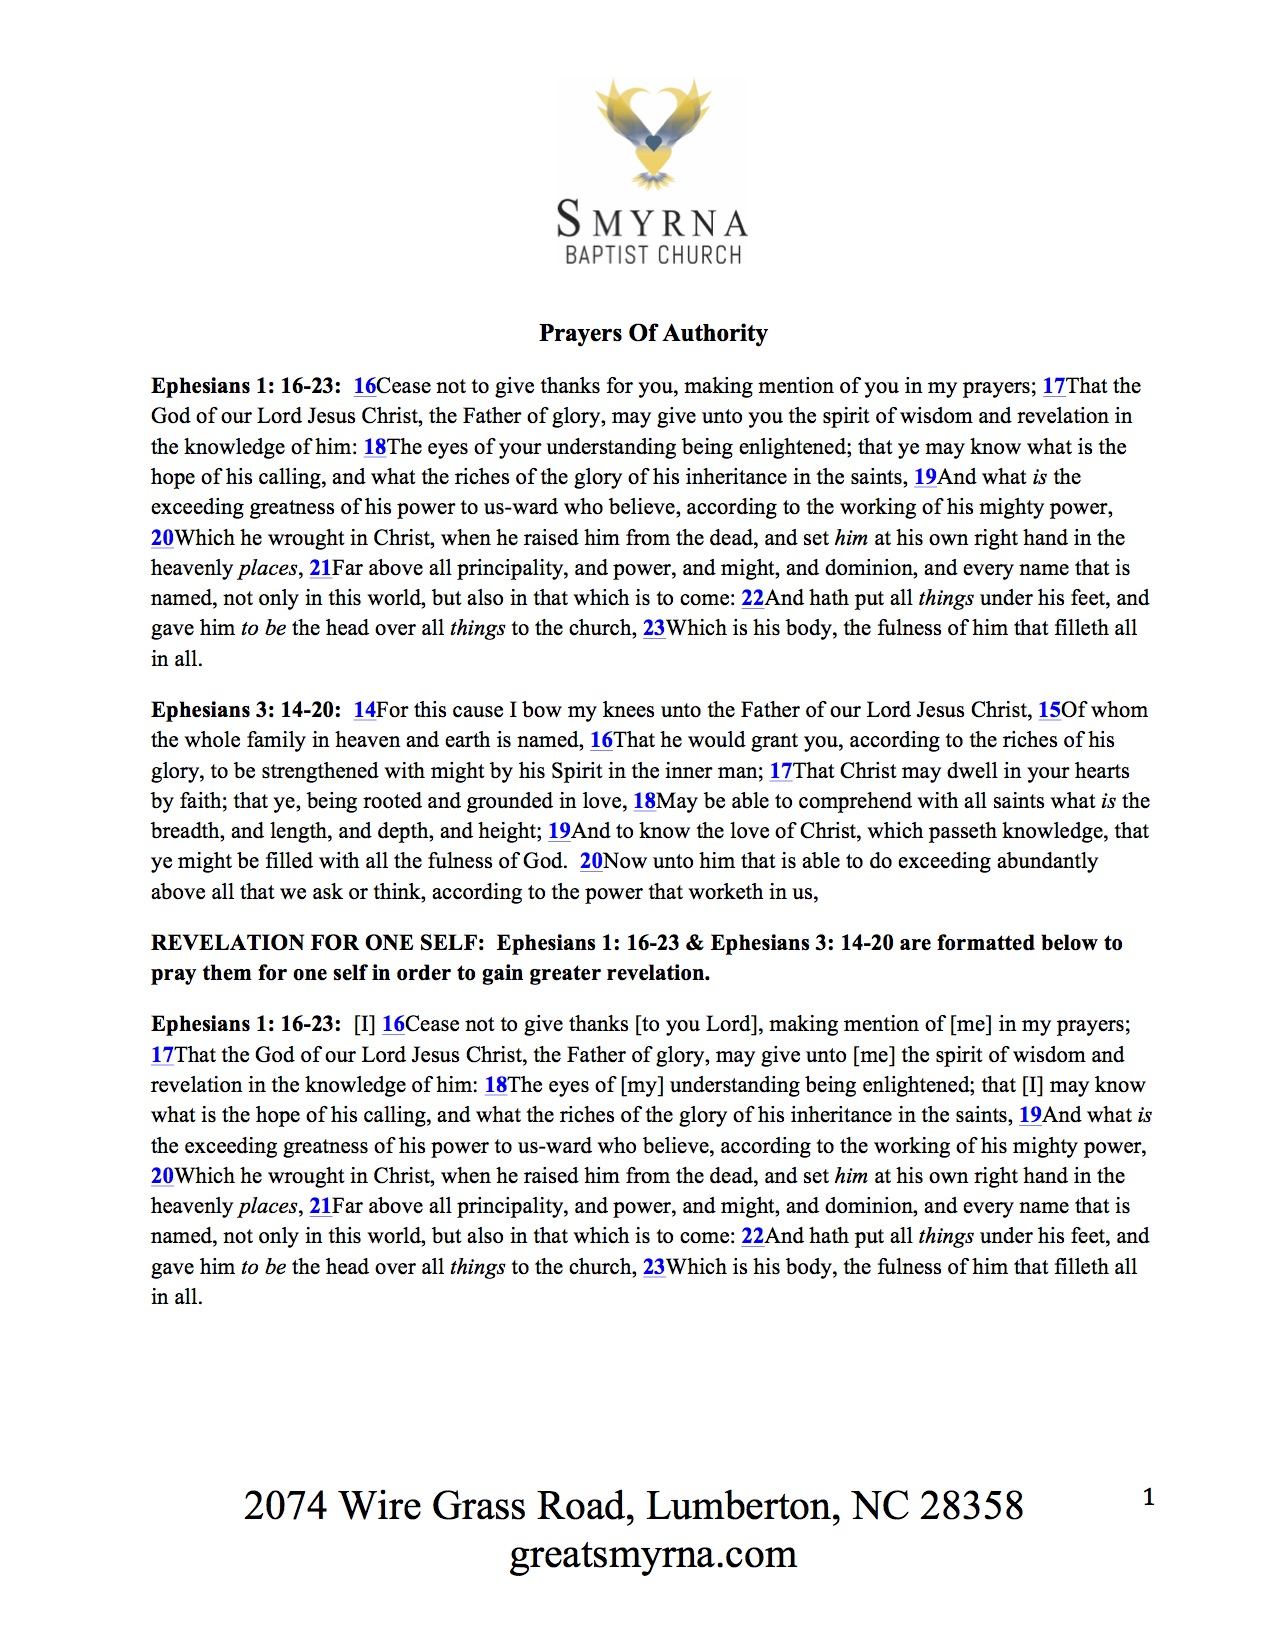 Love Opens The Way - Smyrna Baptist ChurchSmyrna Baptist Church